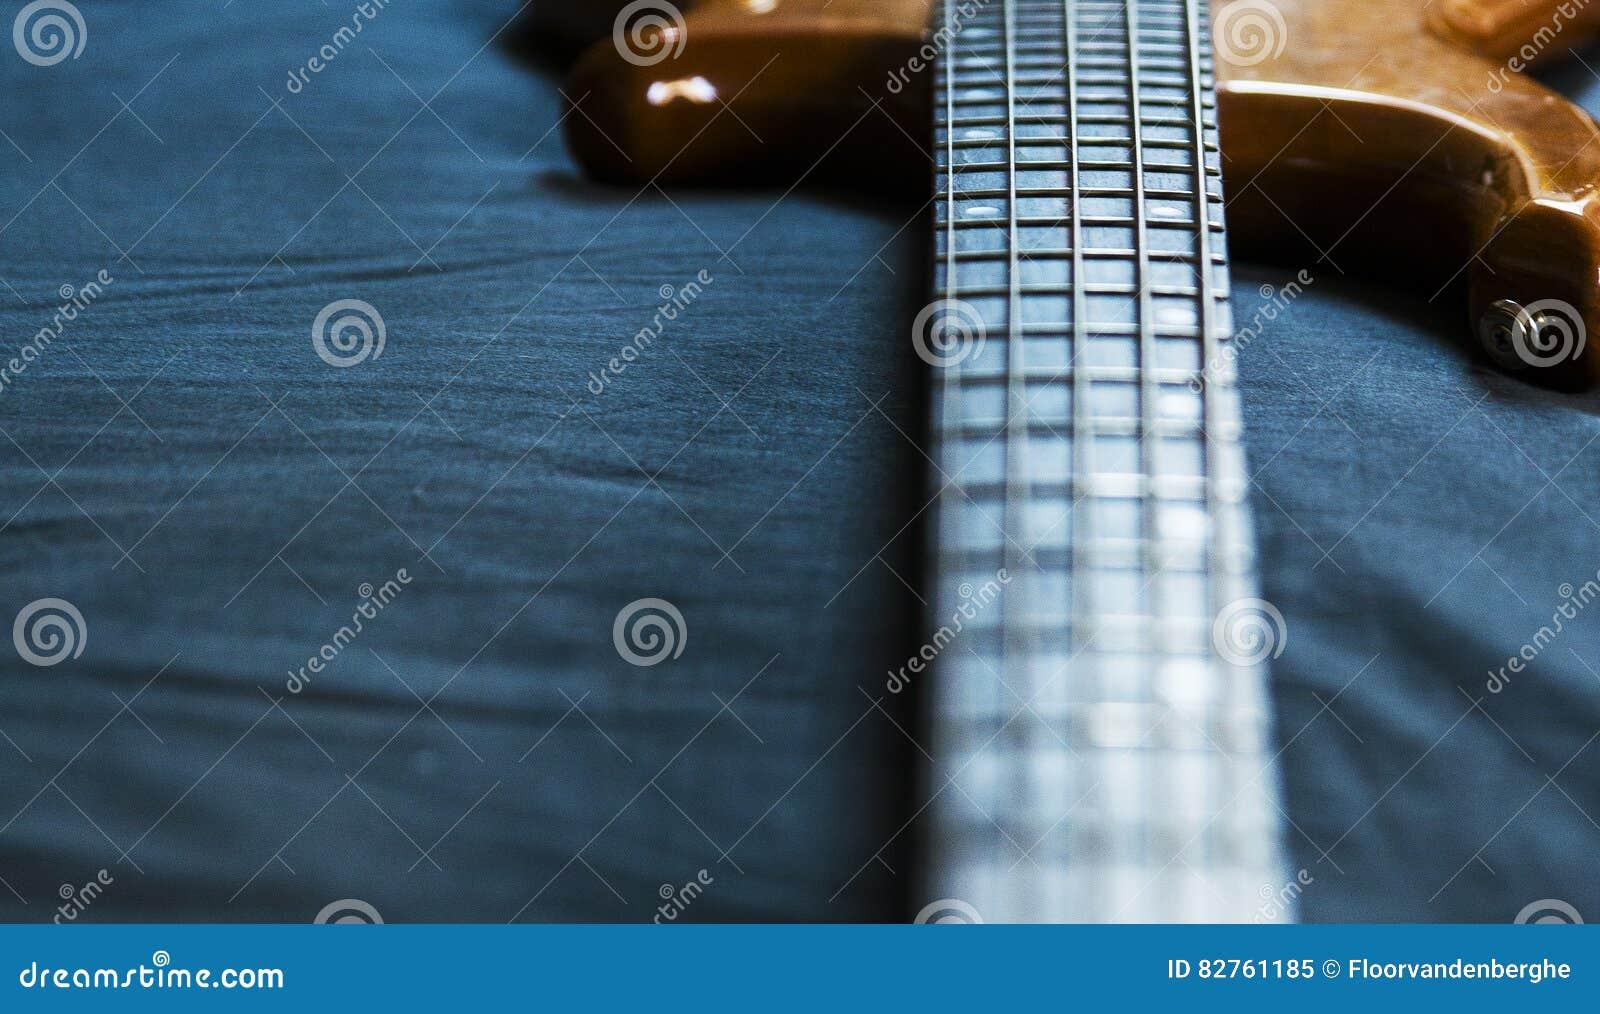 5 String Bass Guitar Wallpaper Stock Image Image Of Bass Beauty